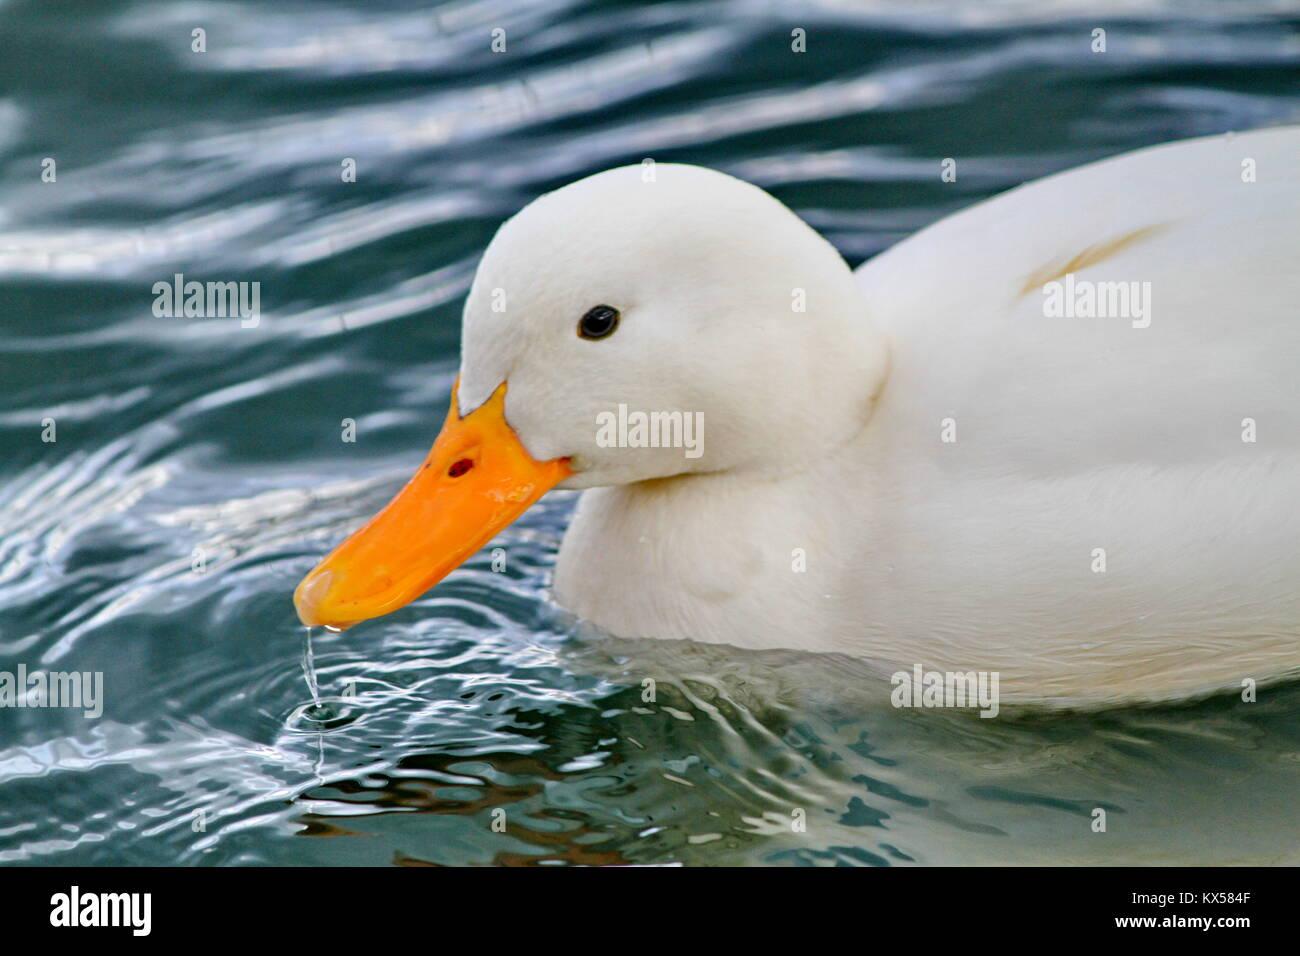 Peking duck on the water eating - Stock Image